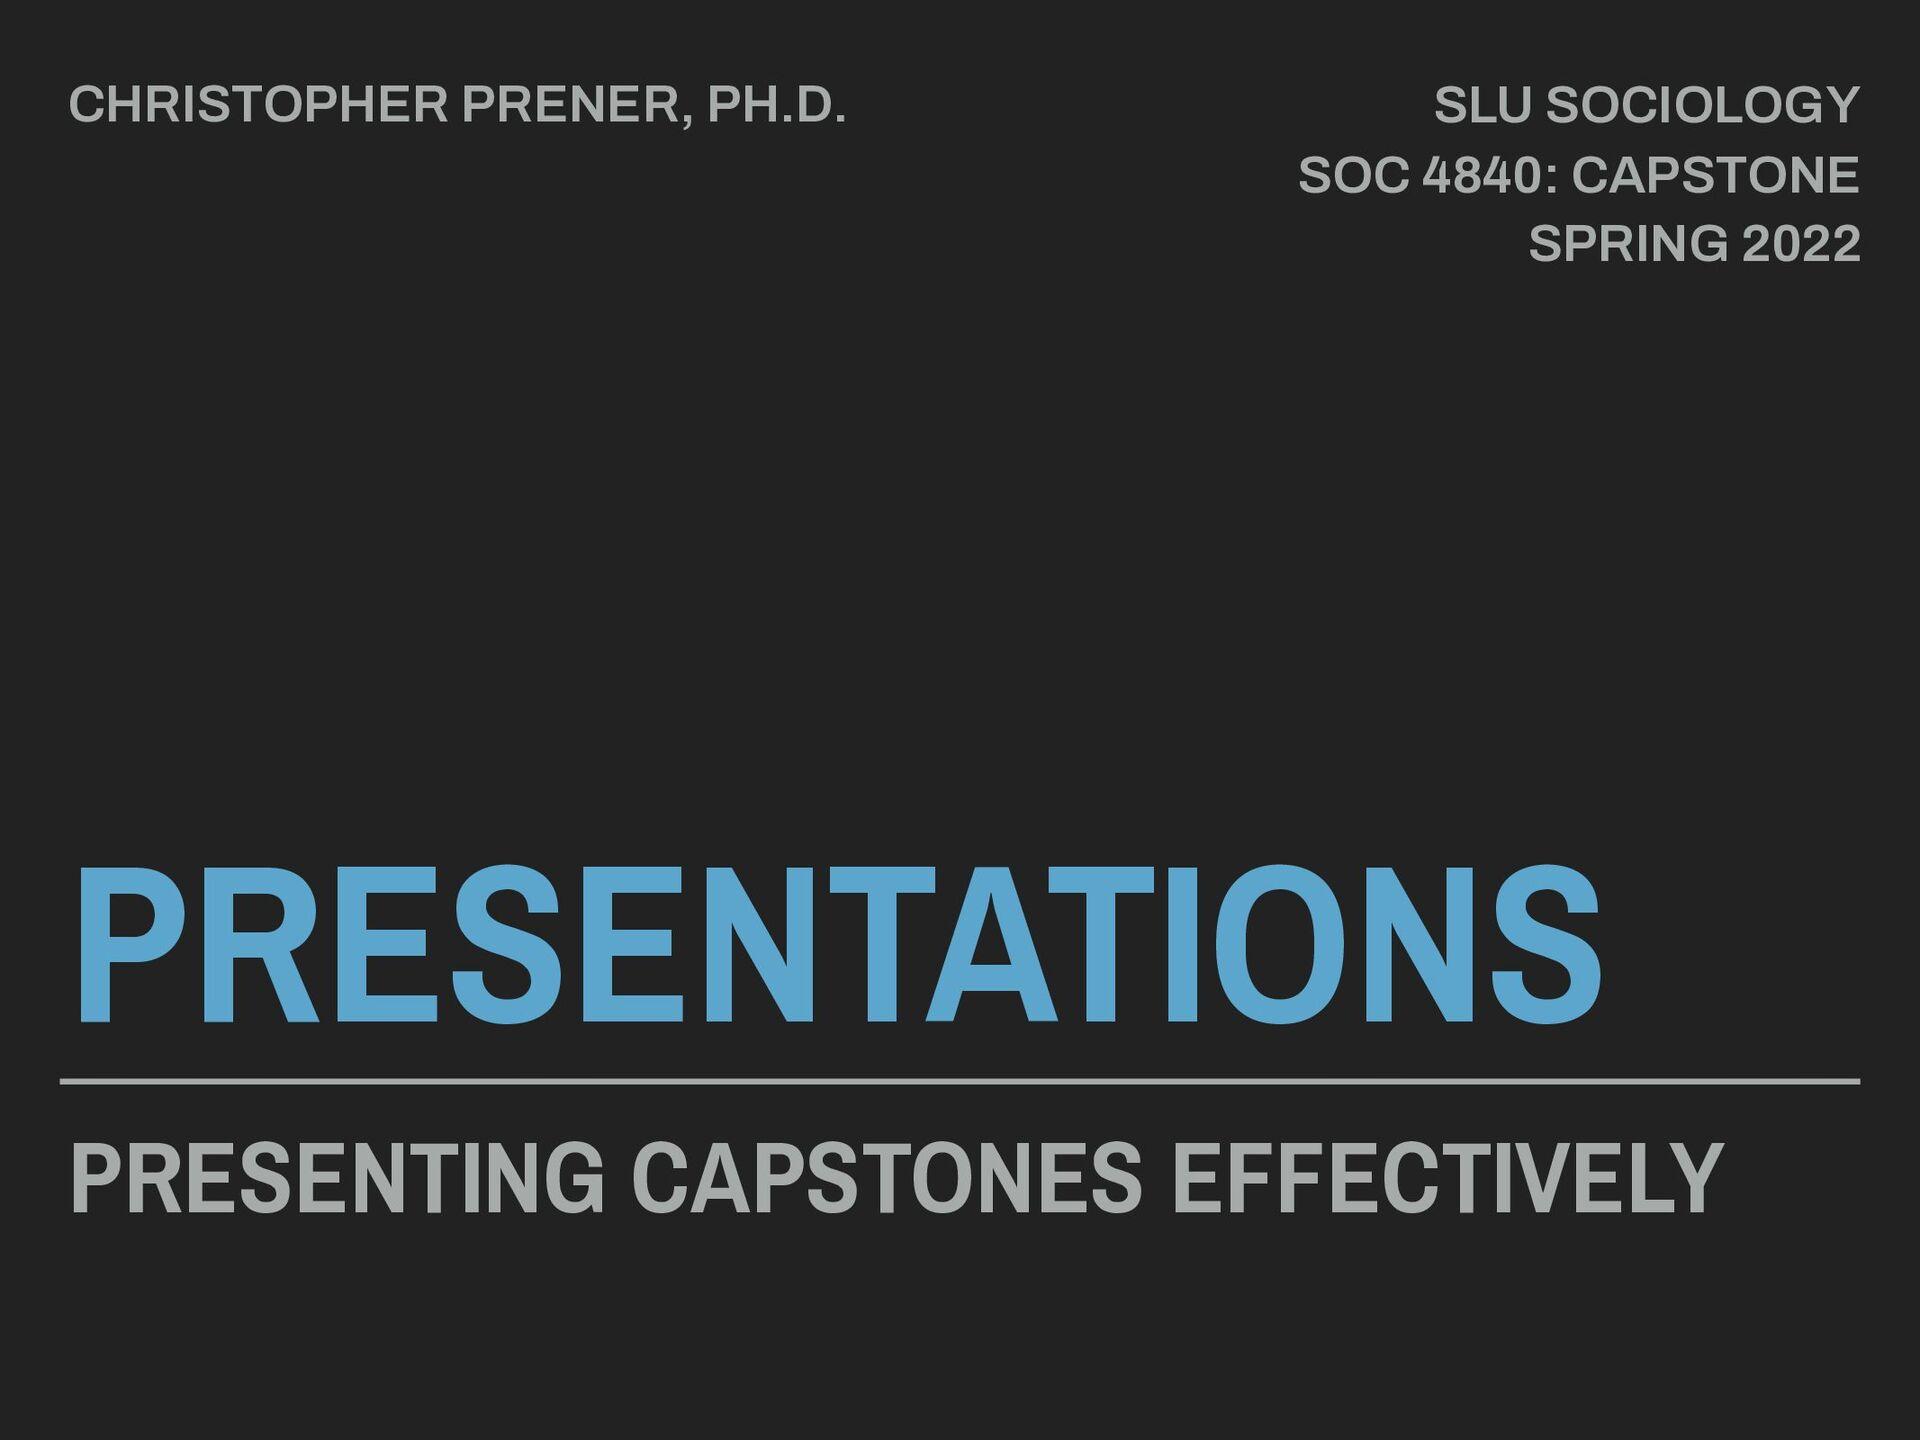 PRESENTATIONS PRESENTING CAPSTONES EFFECTIVELY ...